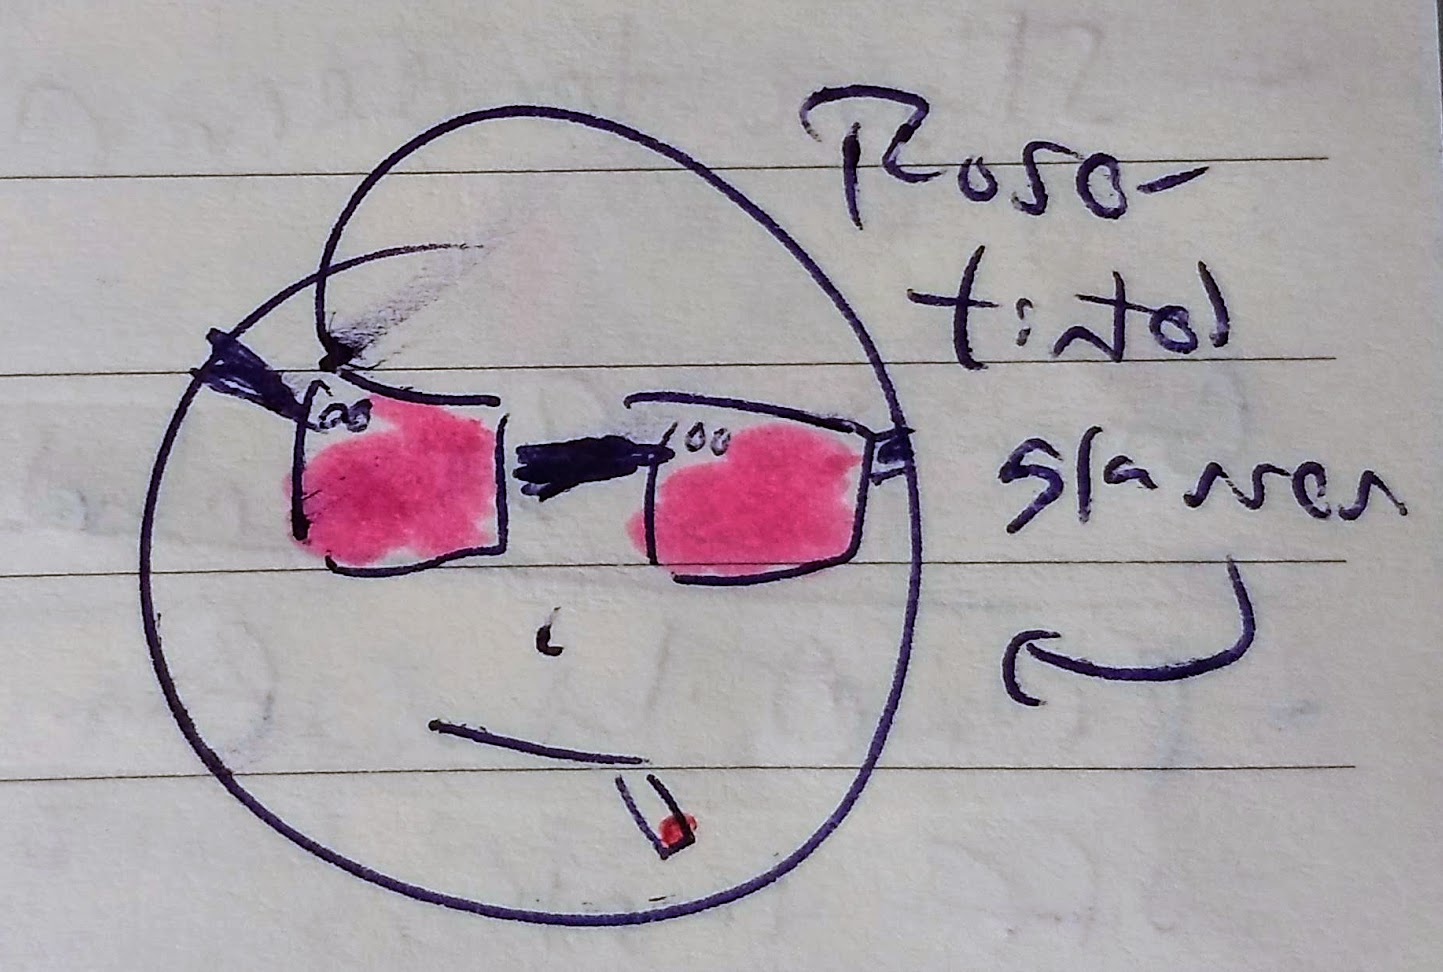 Sunday Doodles I, 10 November 2019 - Rose-Tinted Glasses